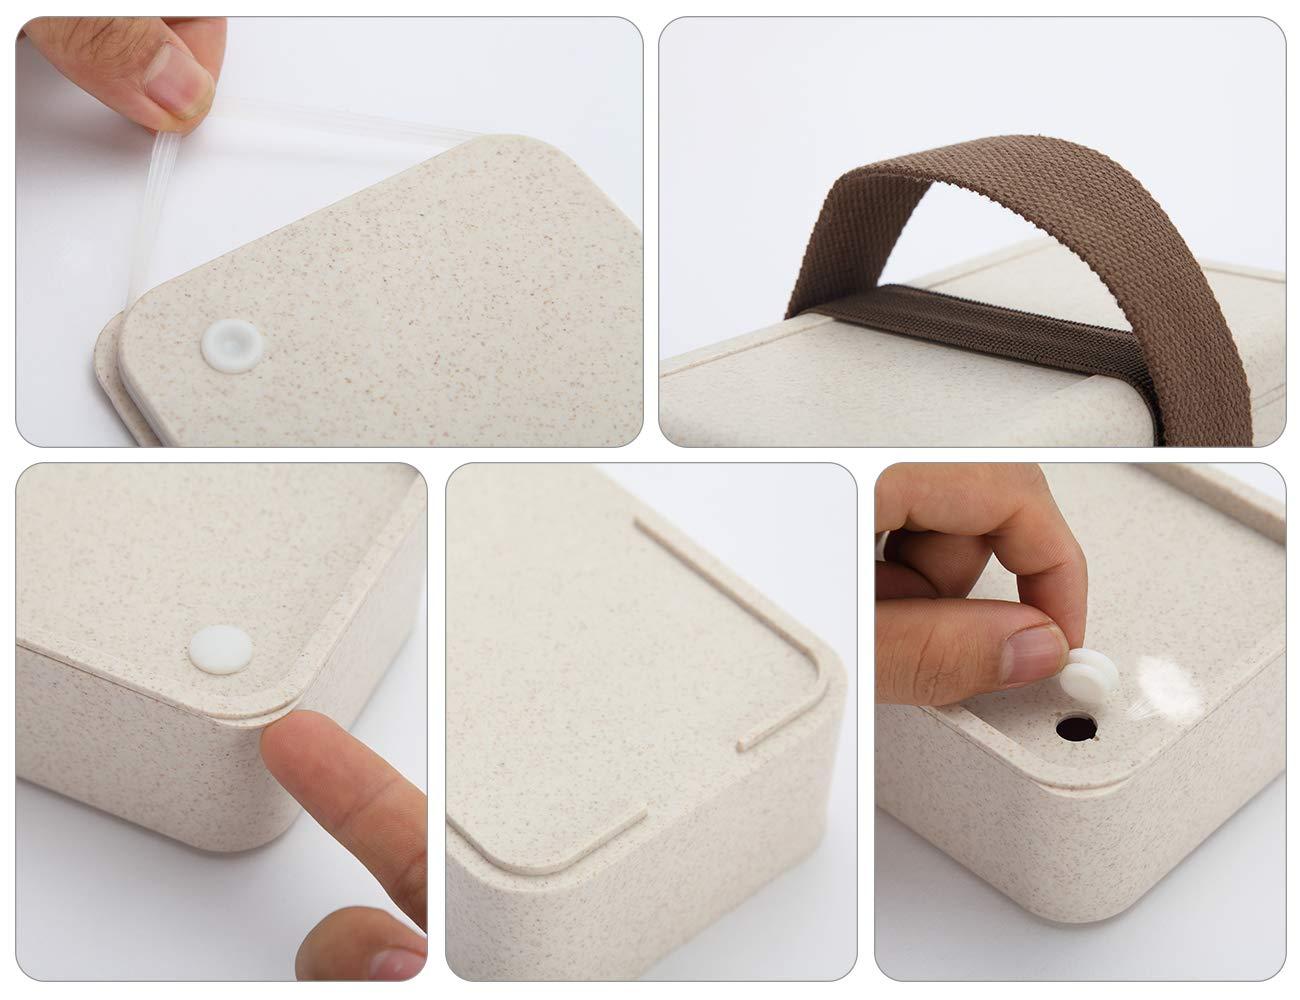 Amazon.com: YBOBK HOME Bento Box - Fiambrera para microondas ...